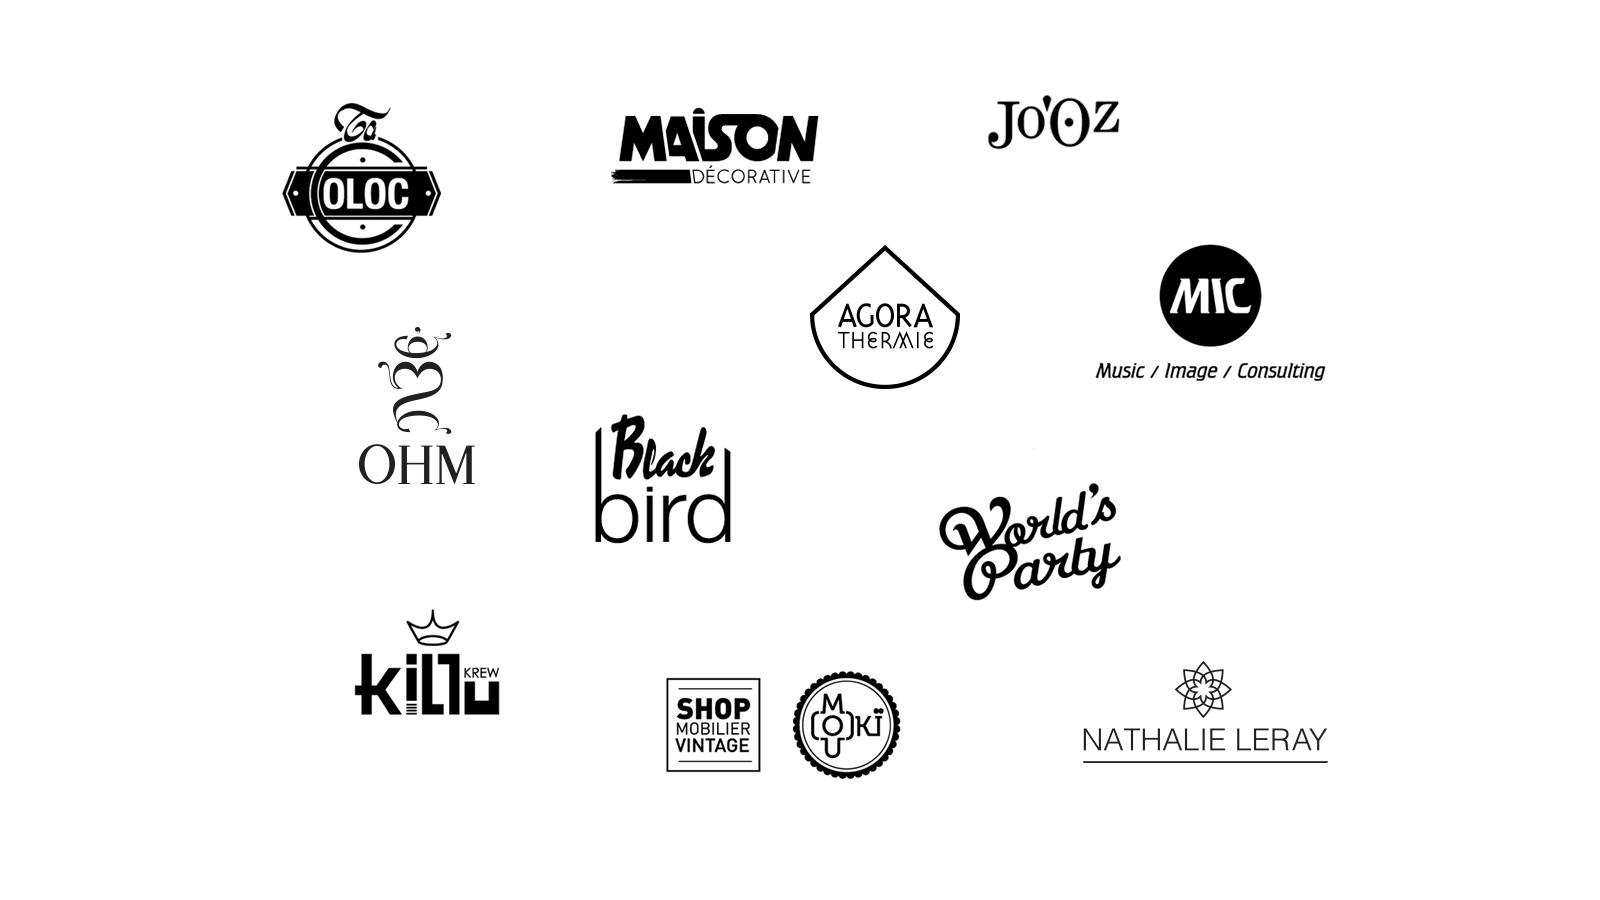 logos-1600x900px